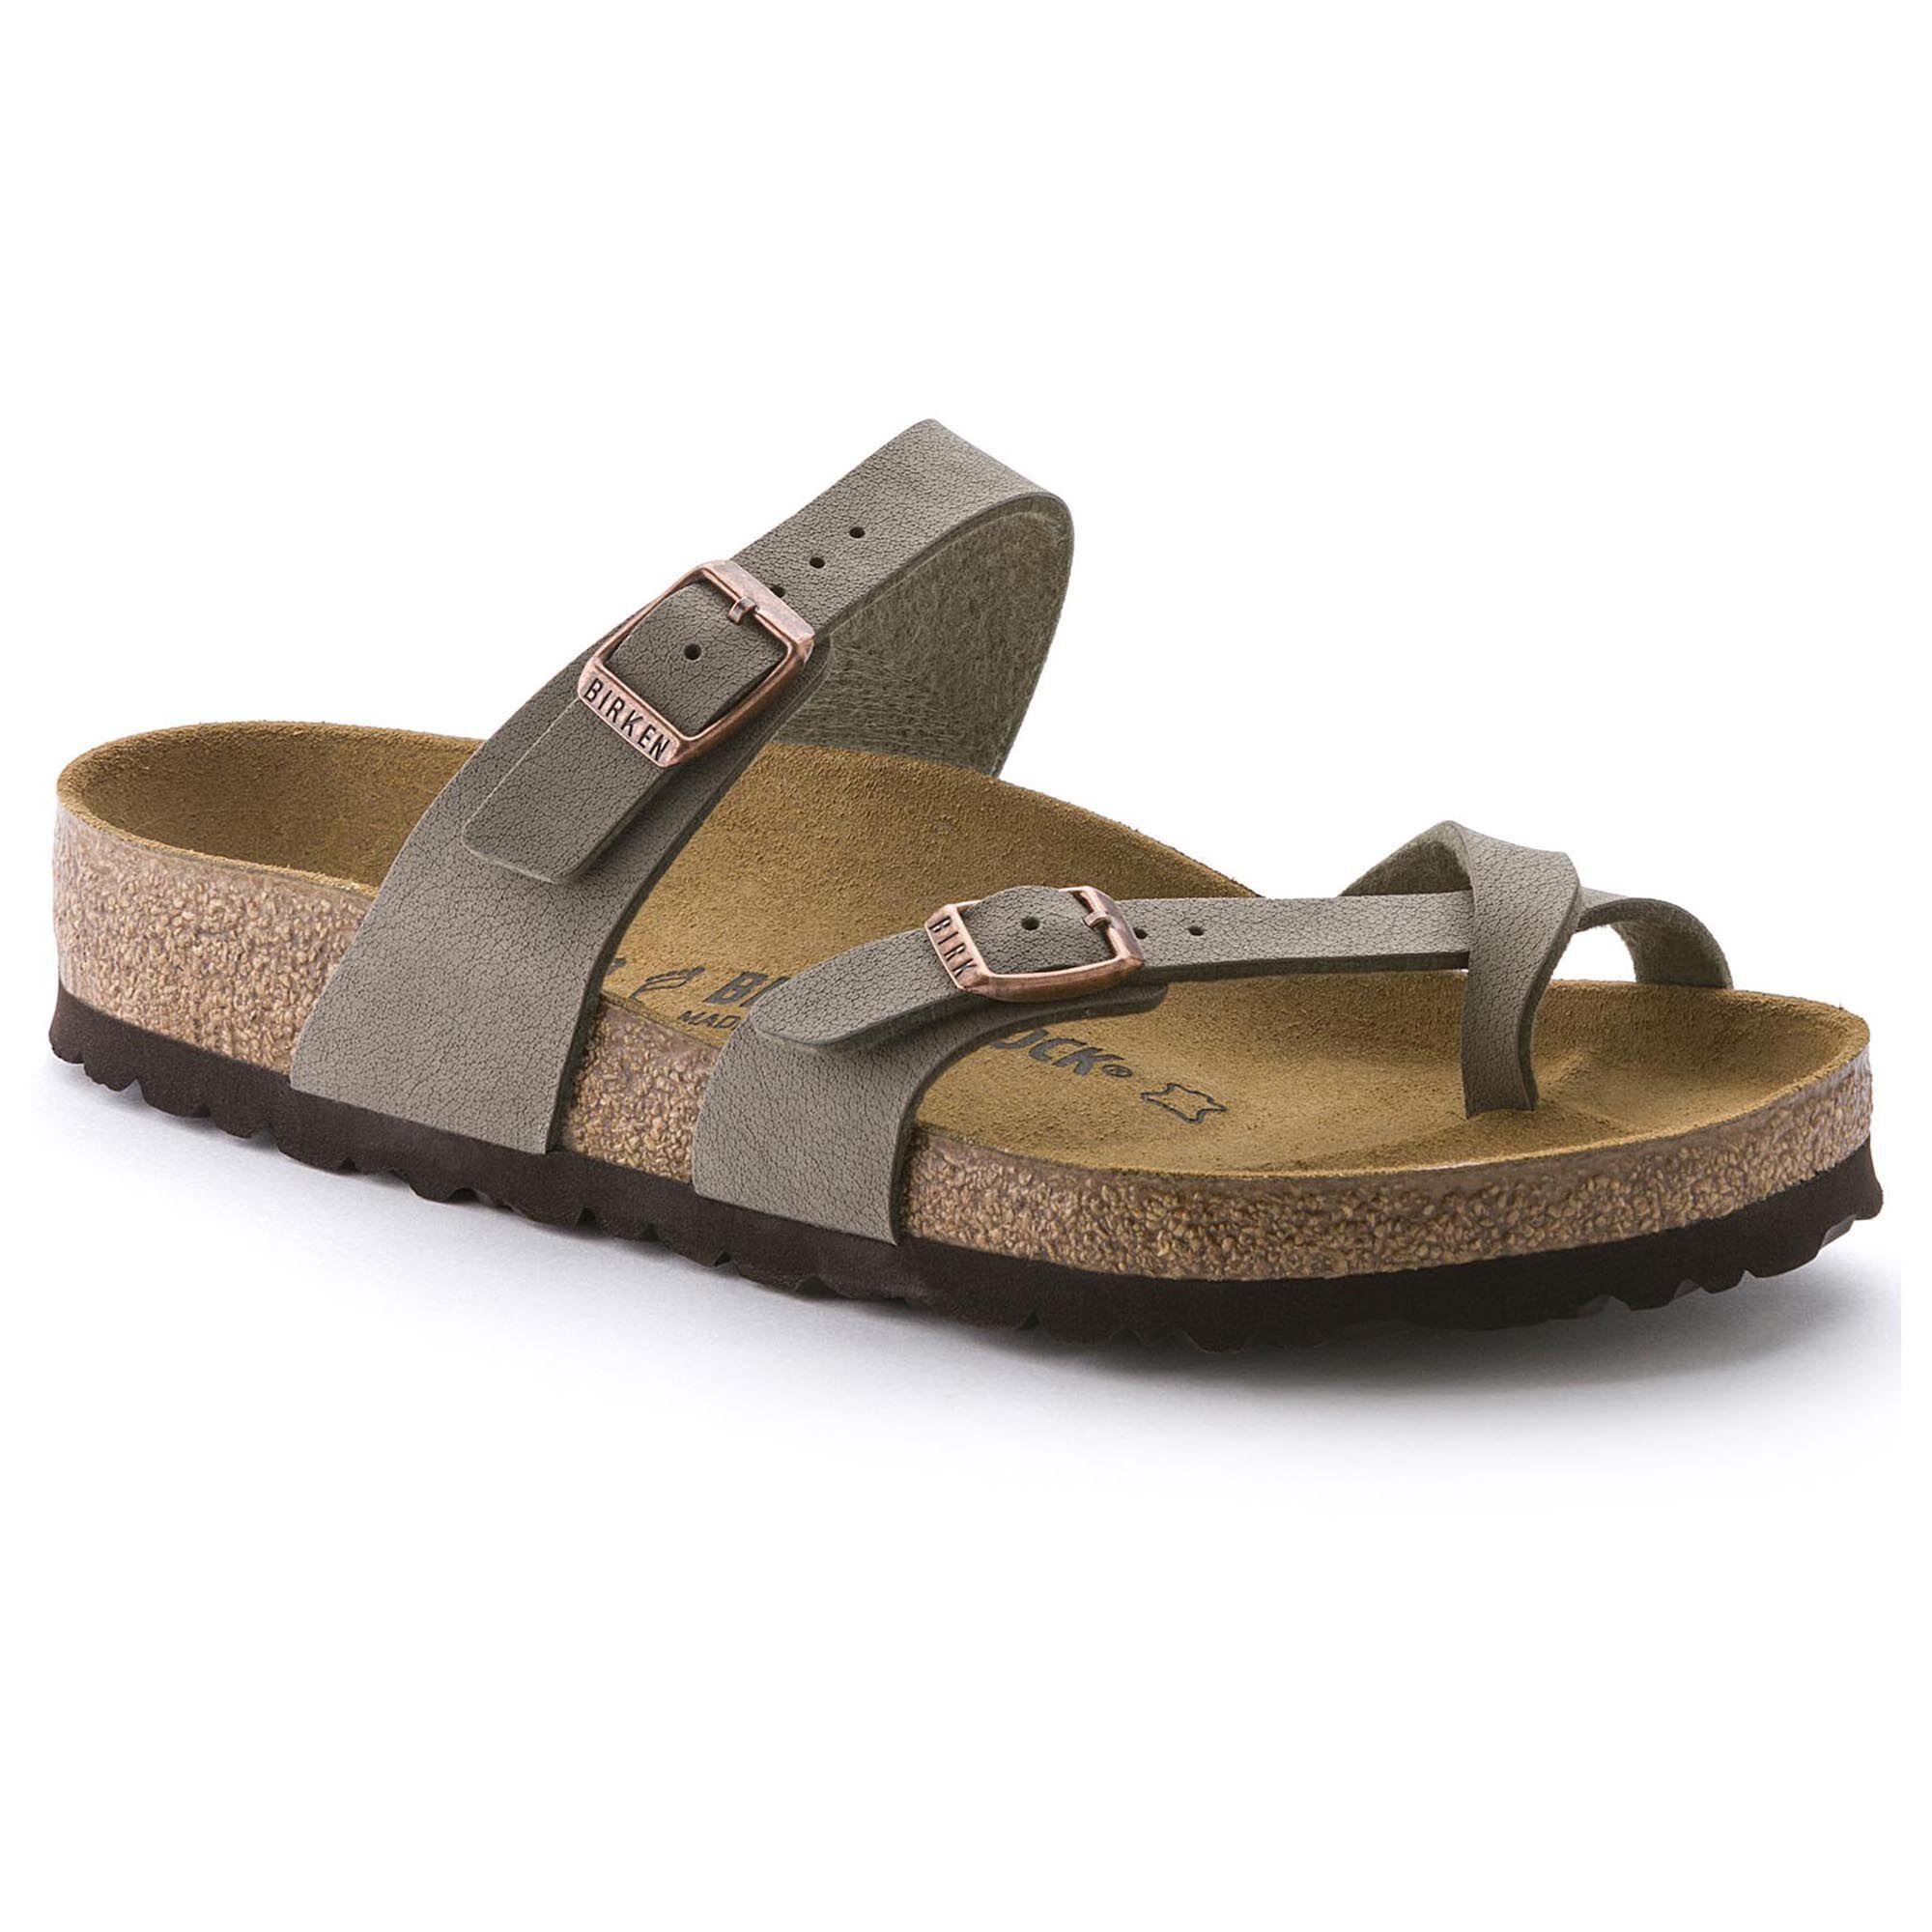 Mens Arizona SFB Open Toe Sandals, Green Birkenstock